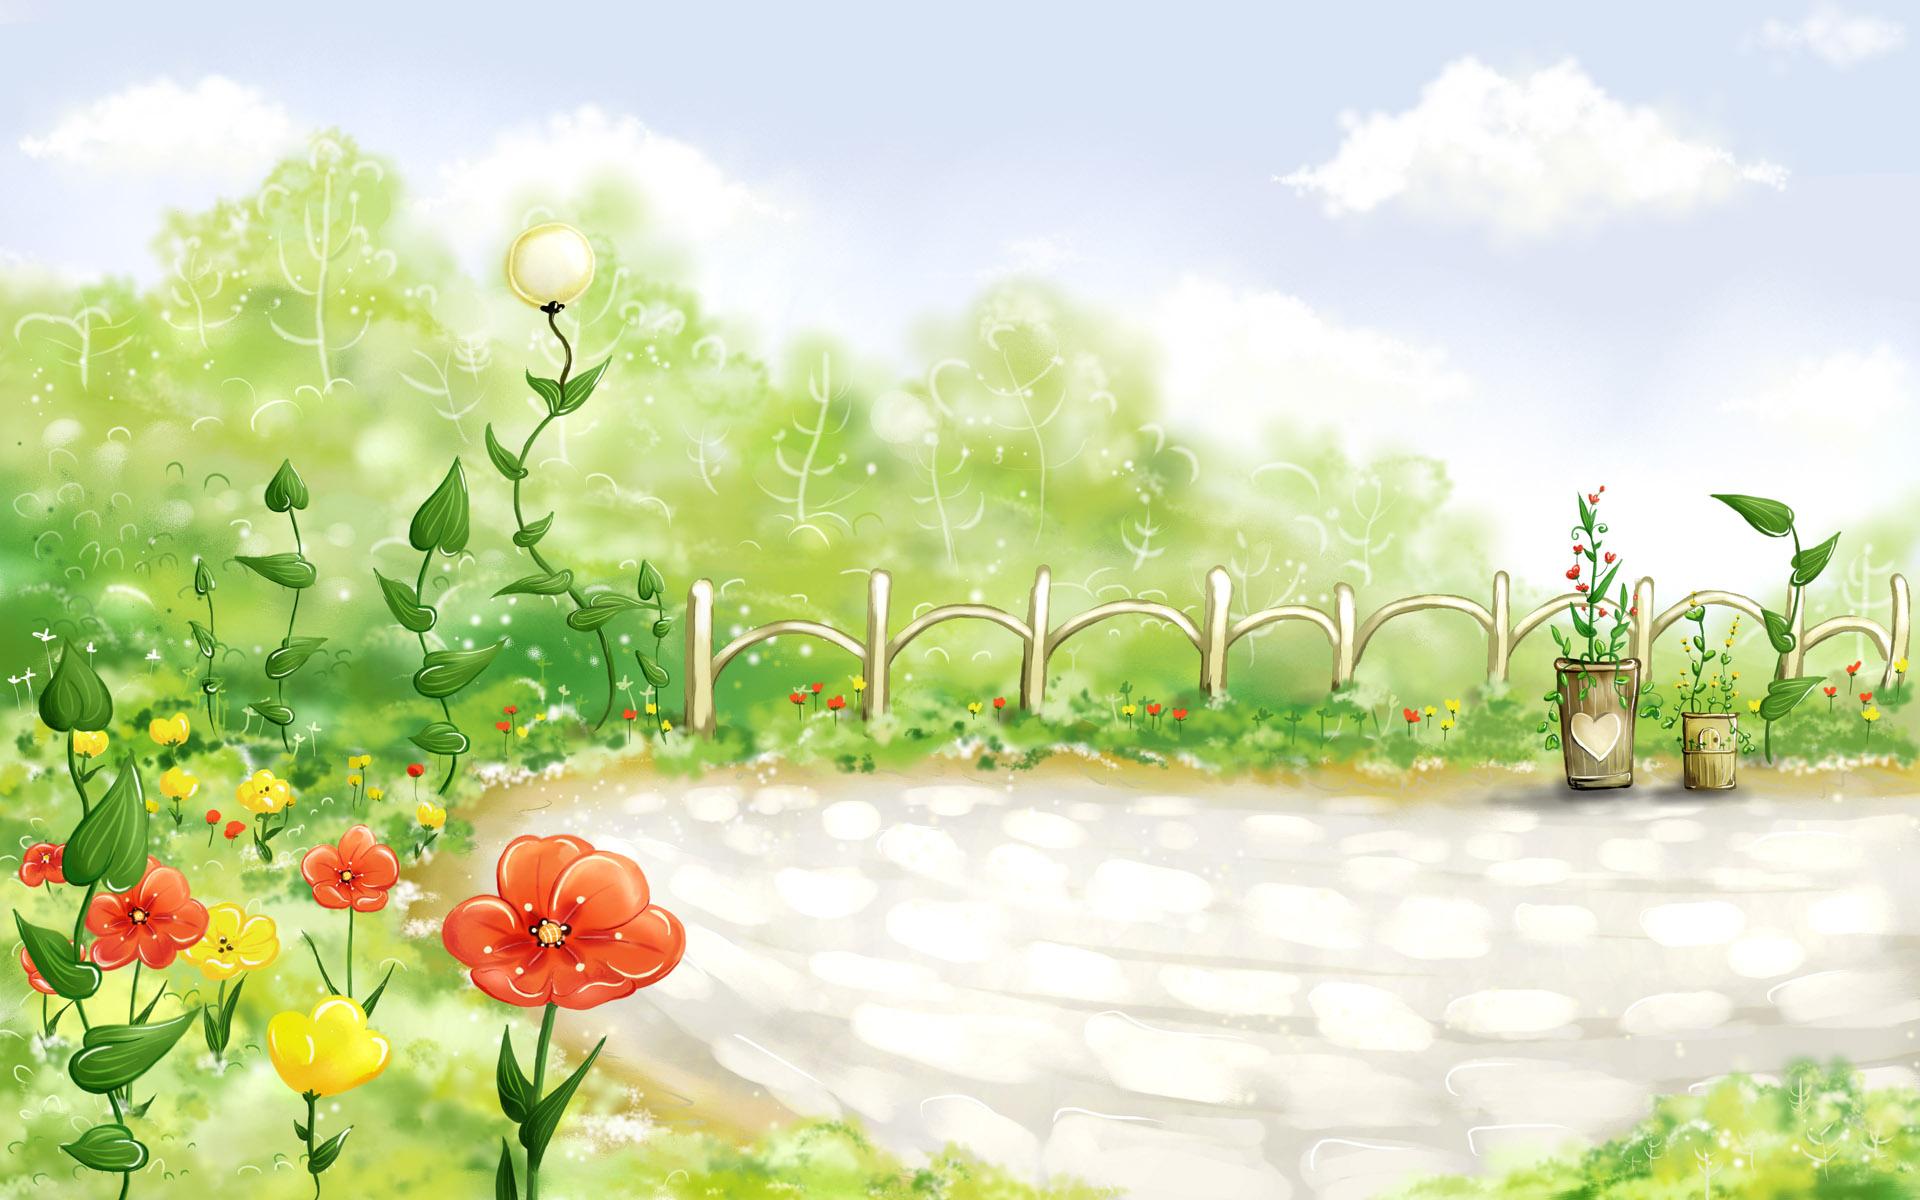 Сказочная картинка луга